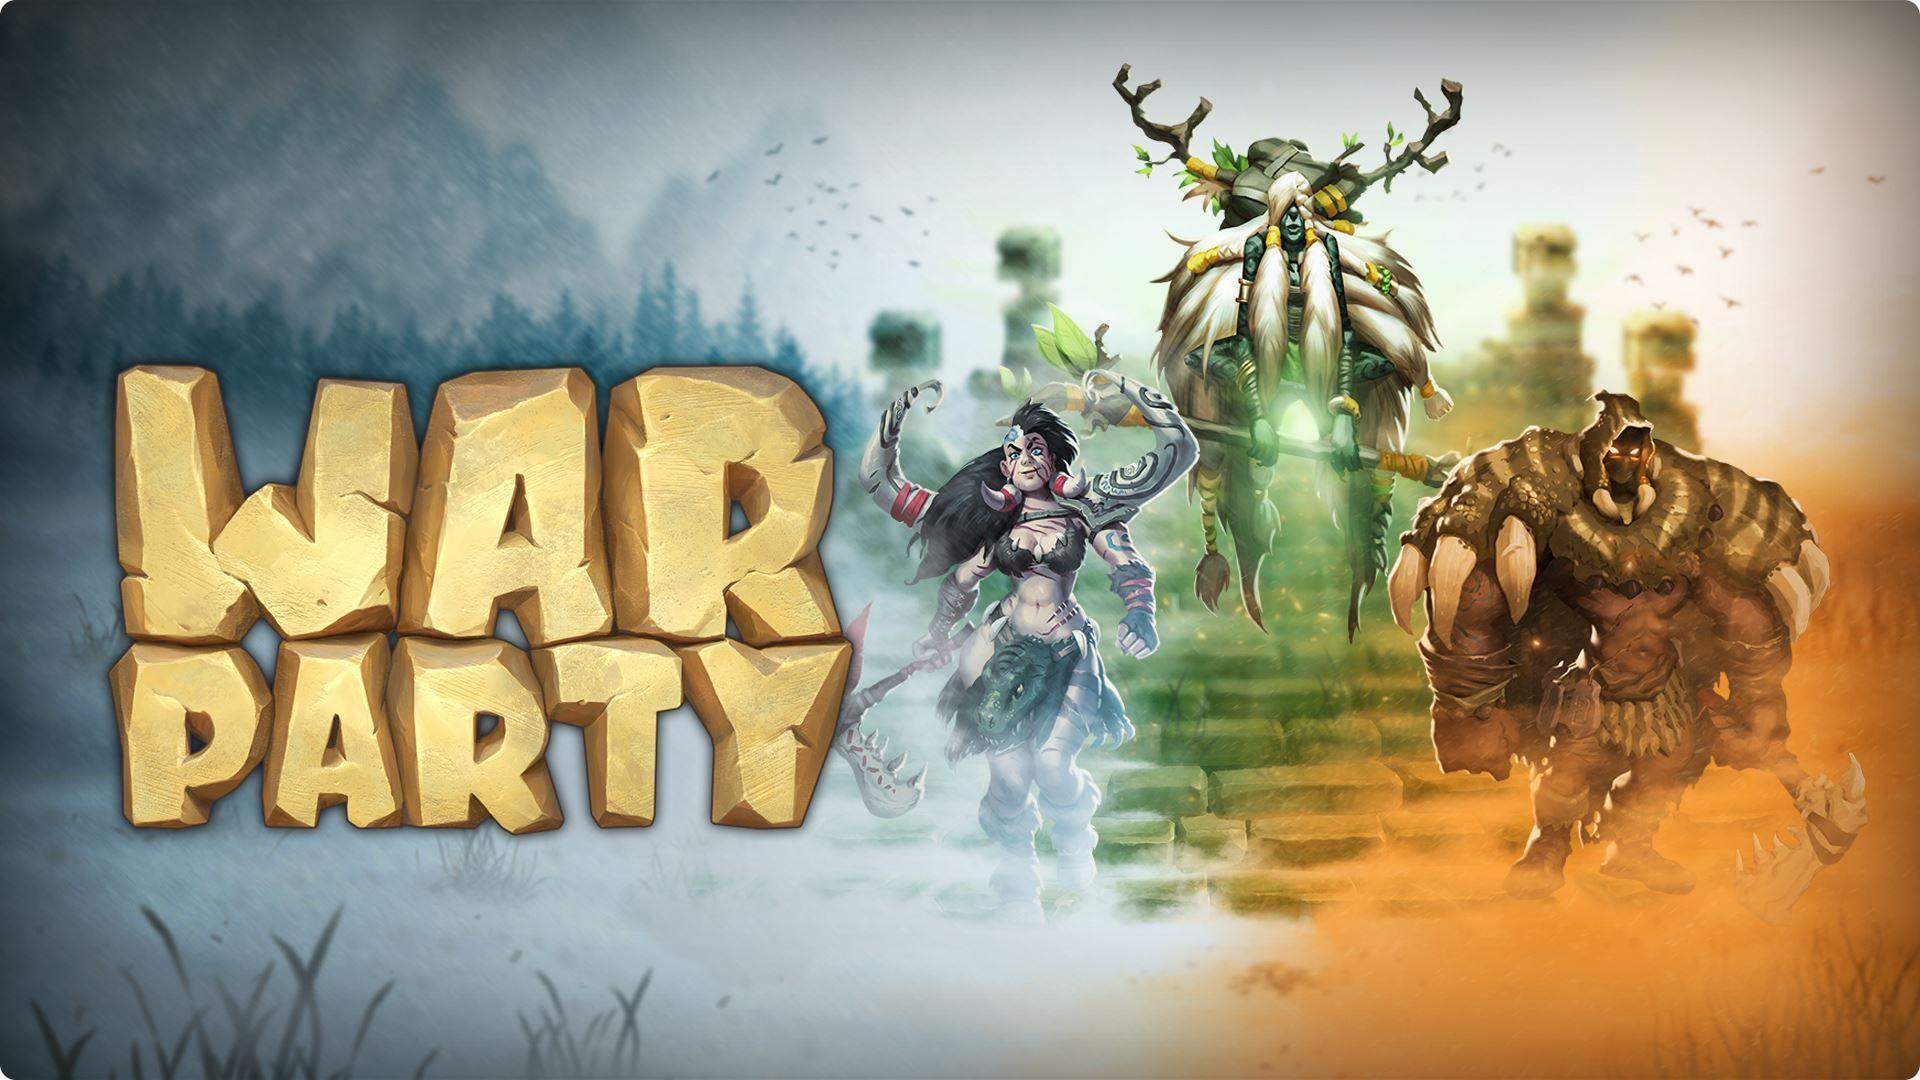 War Party - Quai10